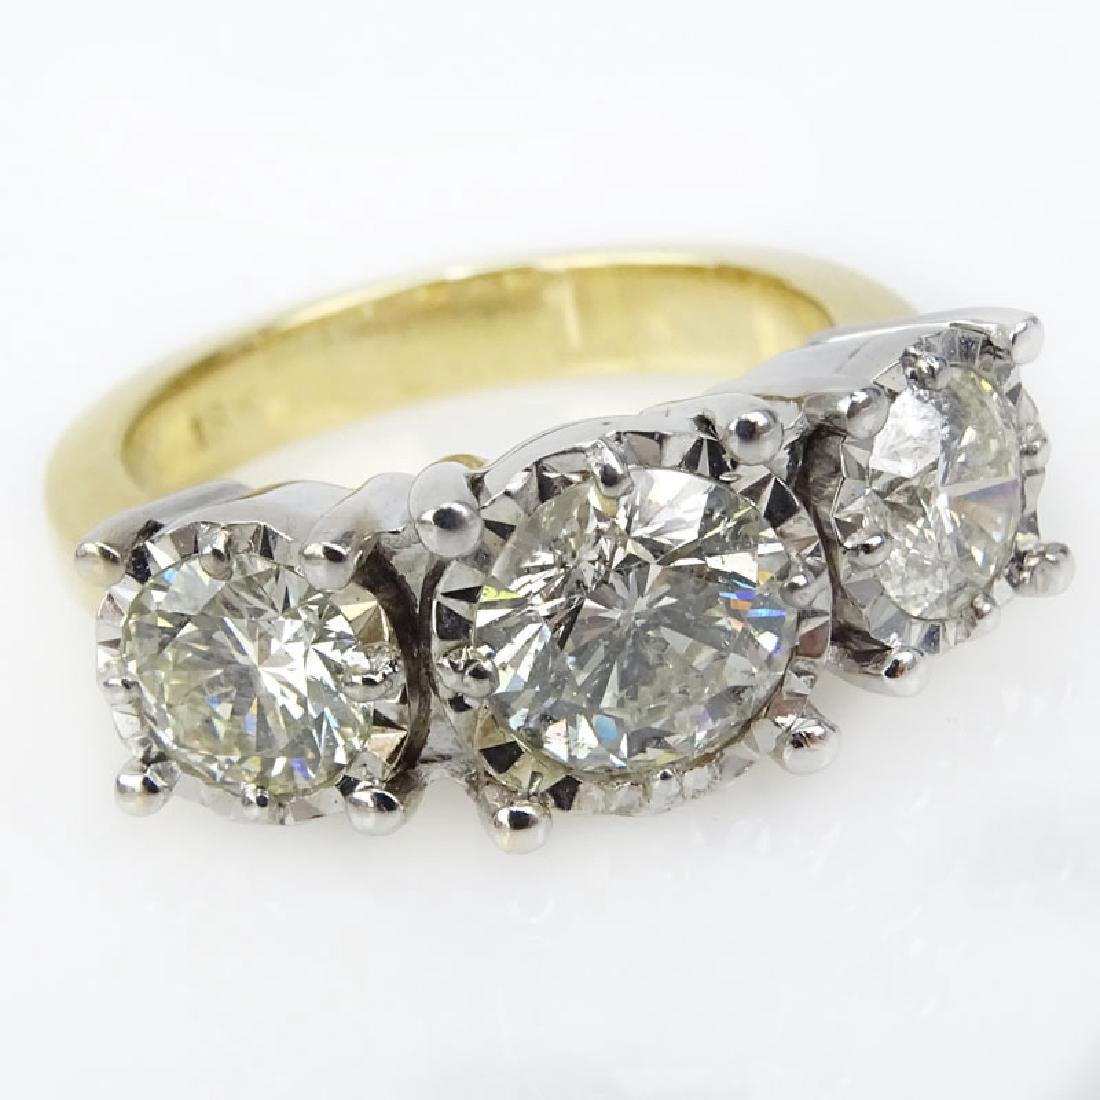 Vintage Approx. 3.75 Carat Round Brilliant Cut Diamond